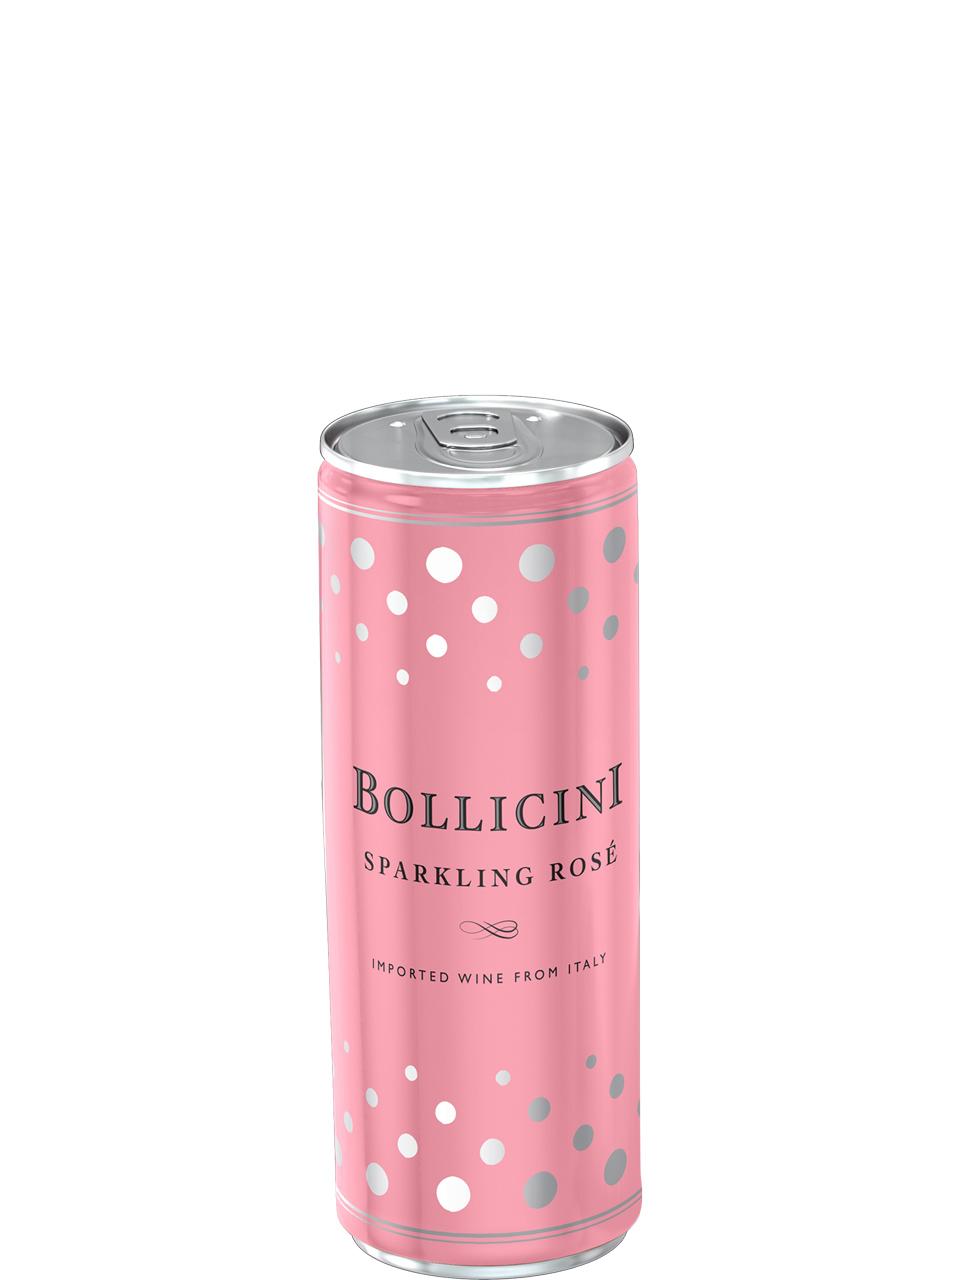 Bollicini Rose Sparkling